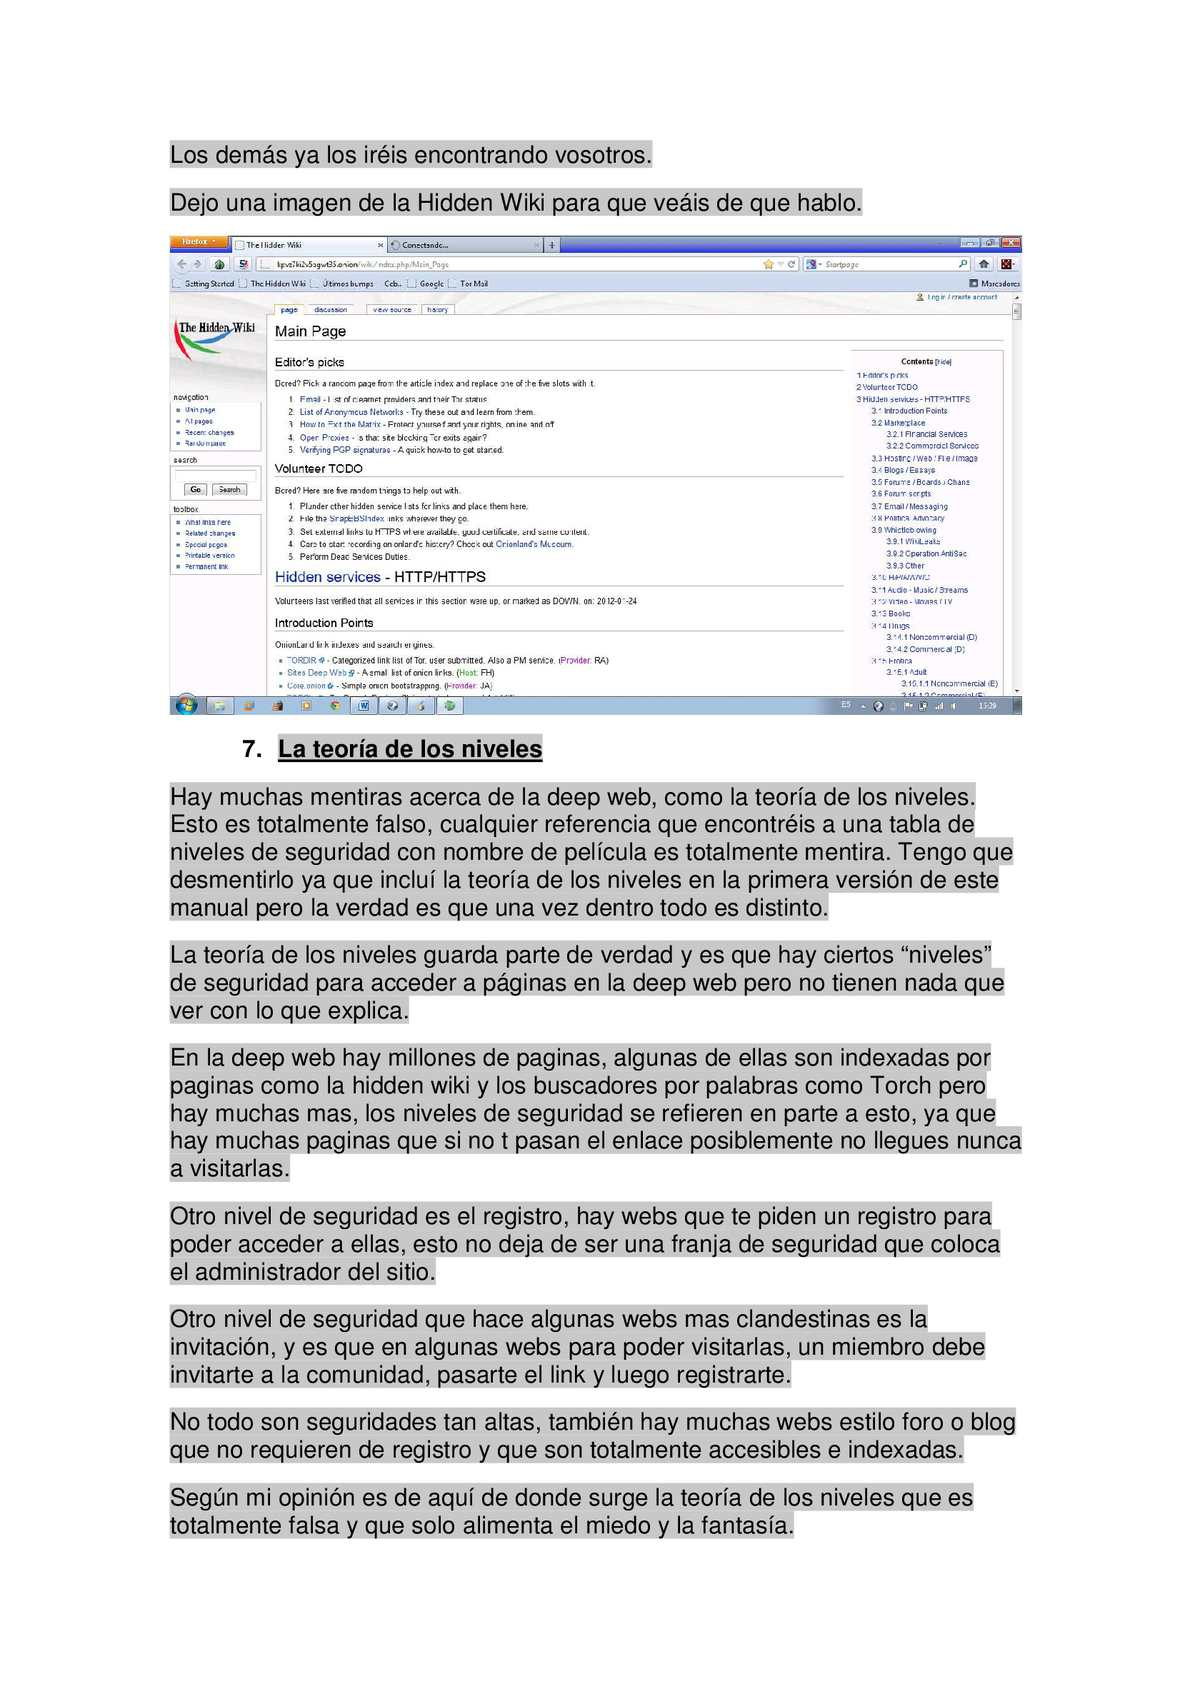 manual para la deep web 2 - CALAMEO Downloader